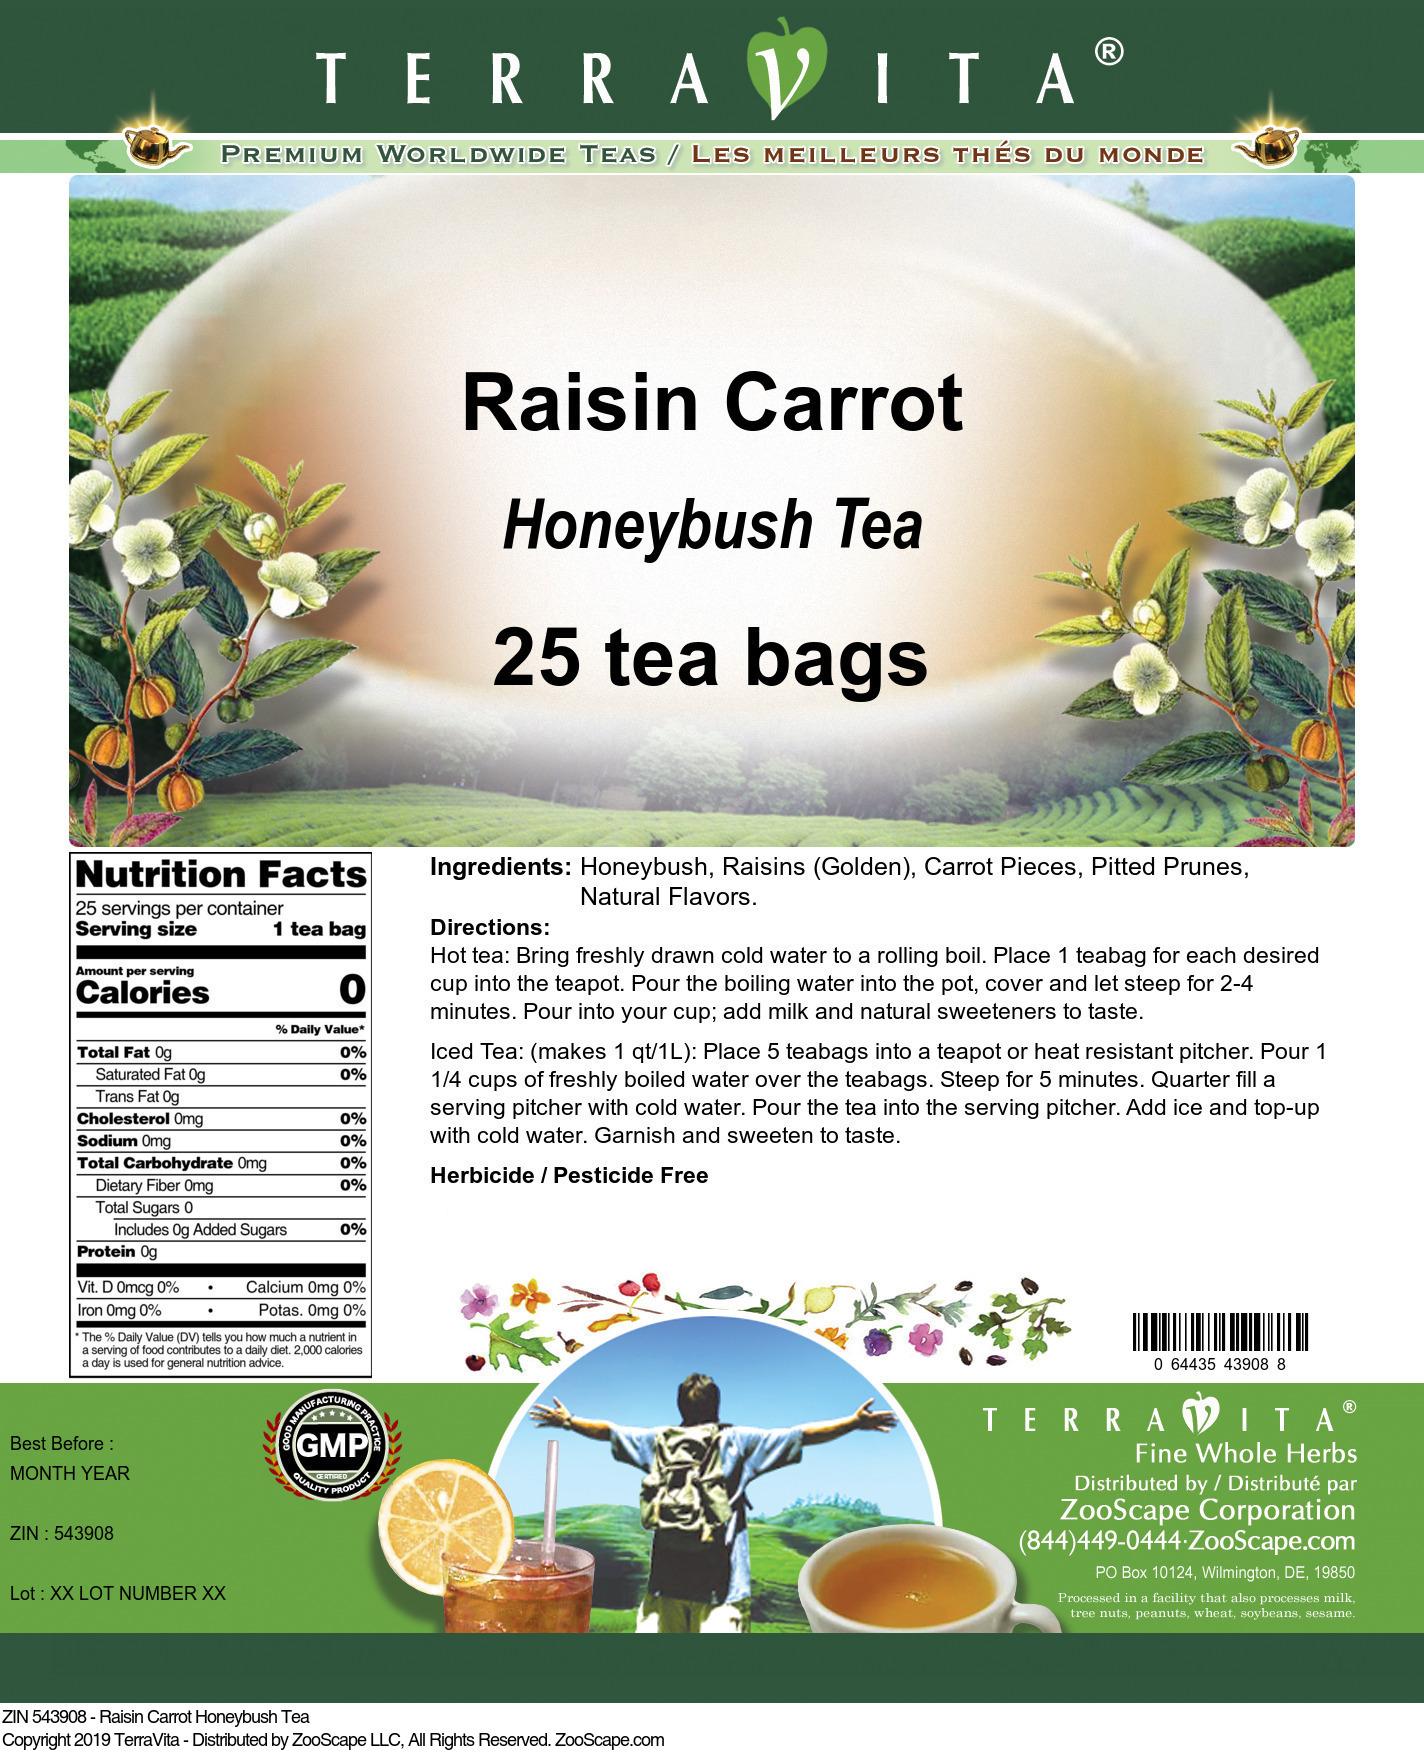 Raisin Carrot Honeybush Tea